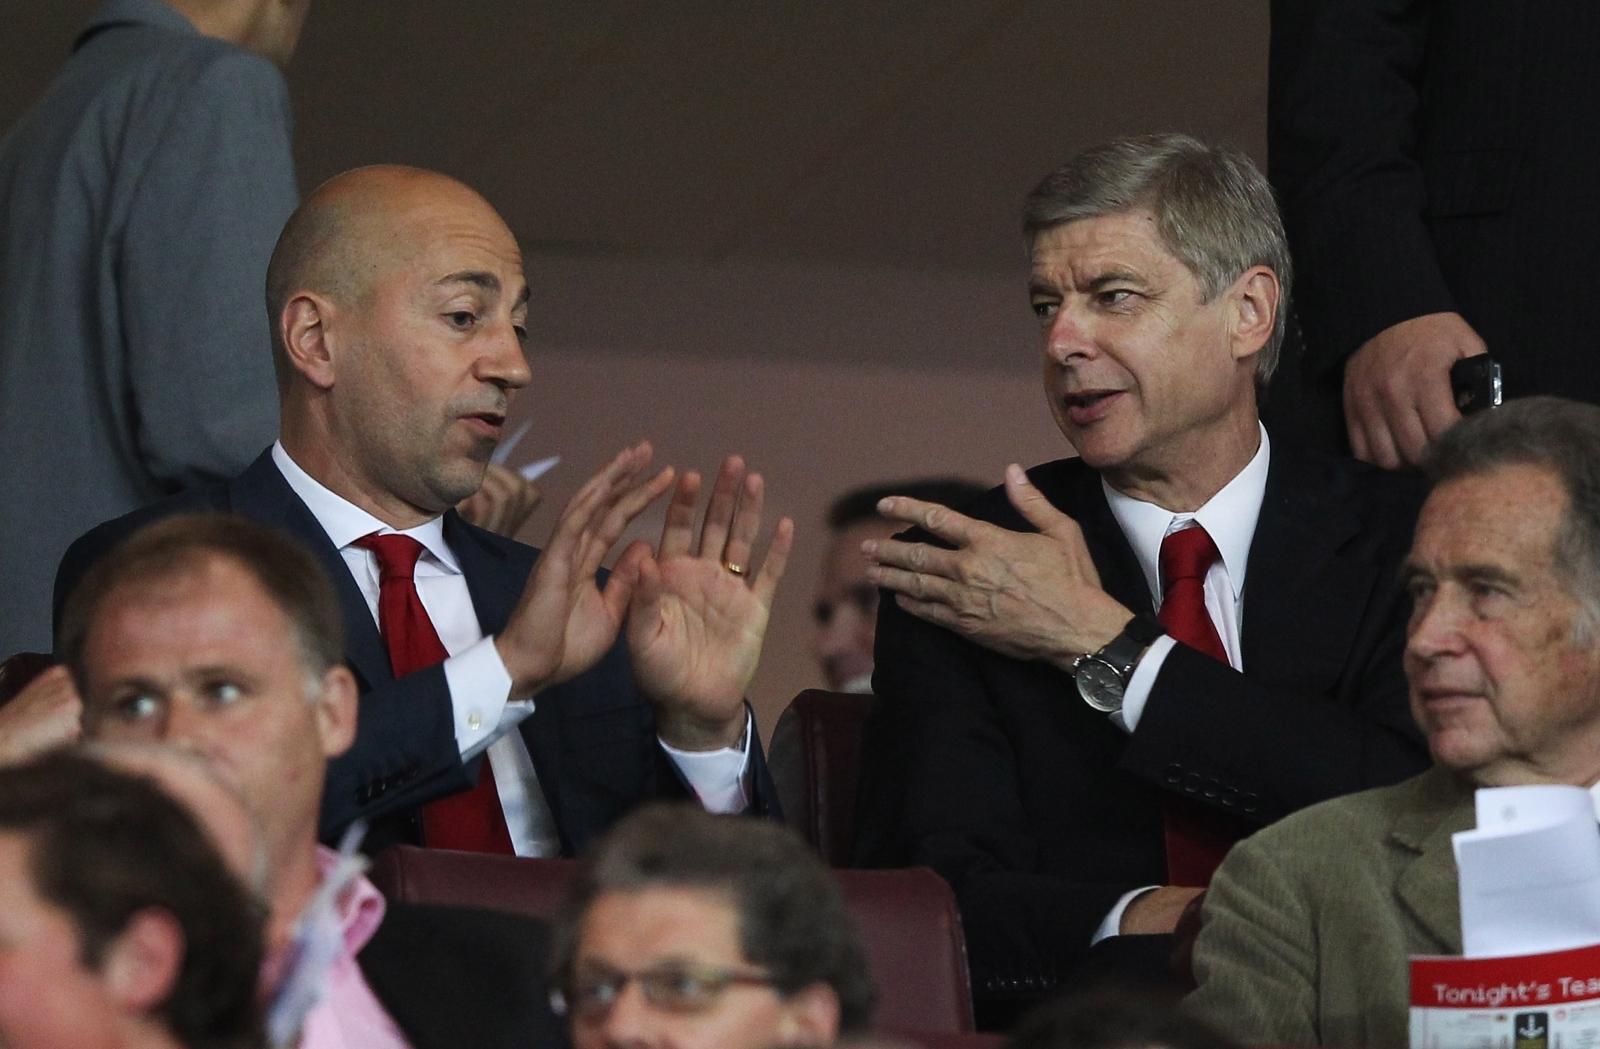 Ivan Gazidis and Arsene Wenger